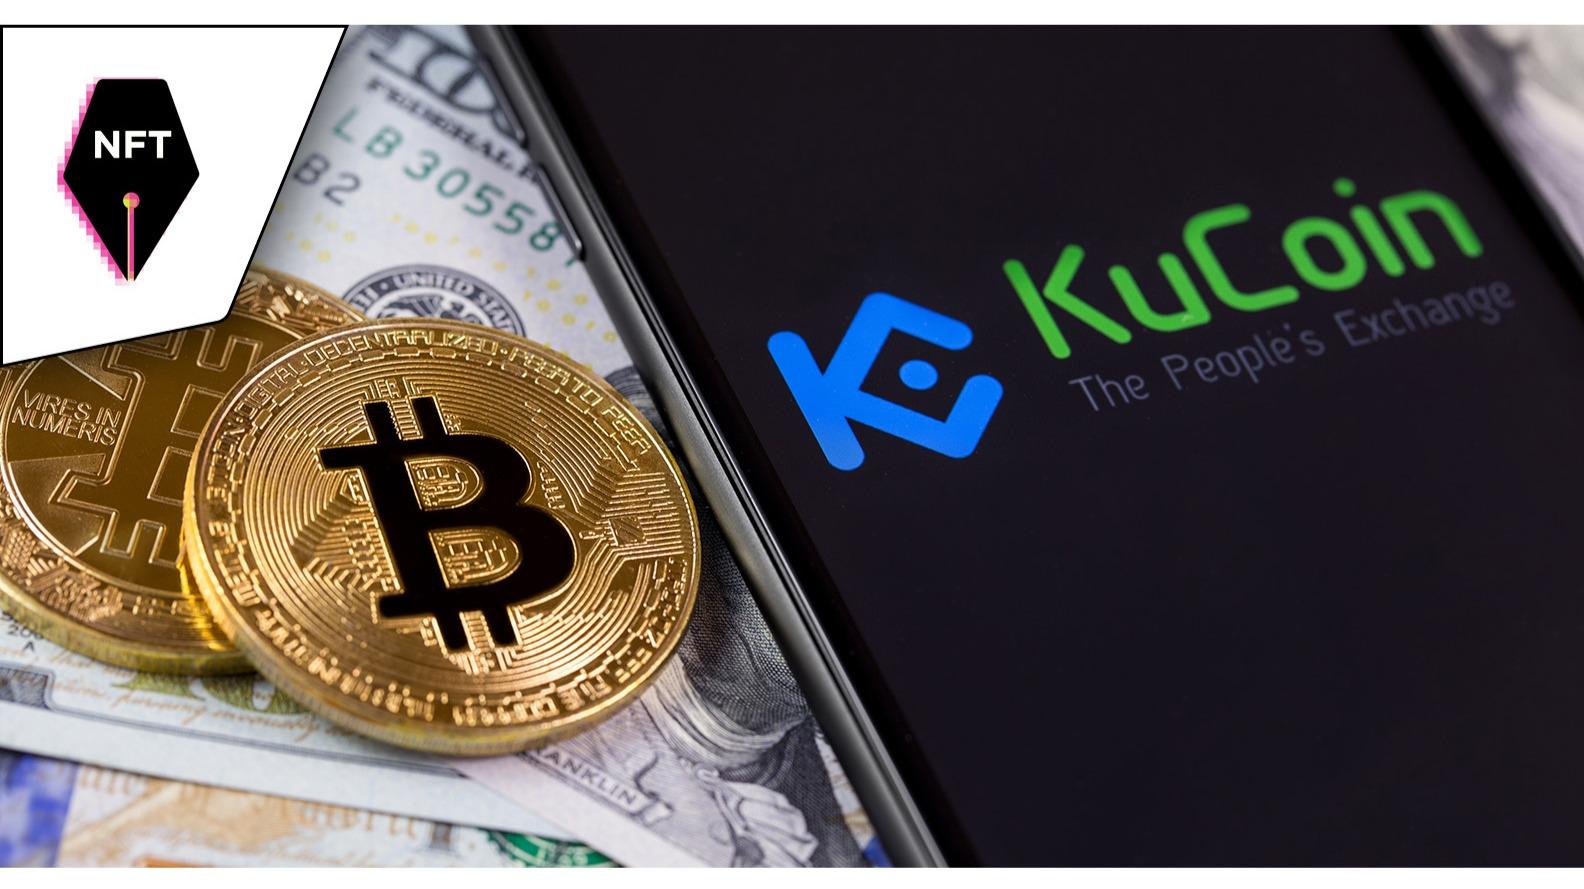 NFTwriter: KuCoin - A Convenient WAX Exchange